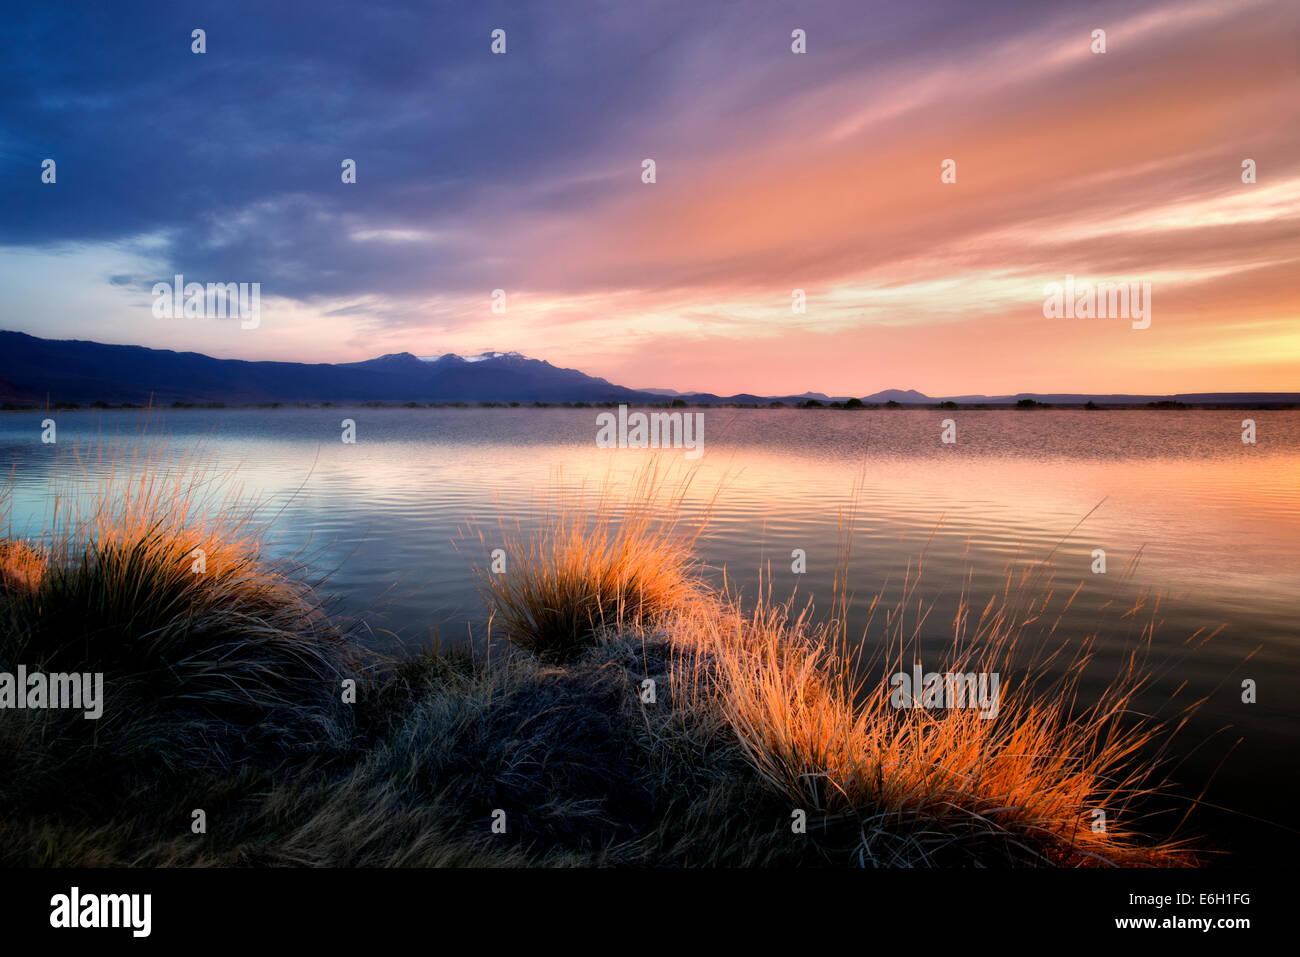 Sonnenaufgang am Borax Teich mit Steens Mountain.  Borax Lake Preserve, Oregon Stockbild